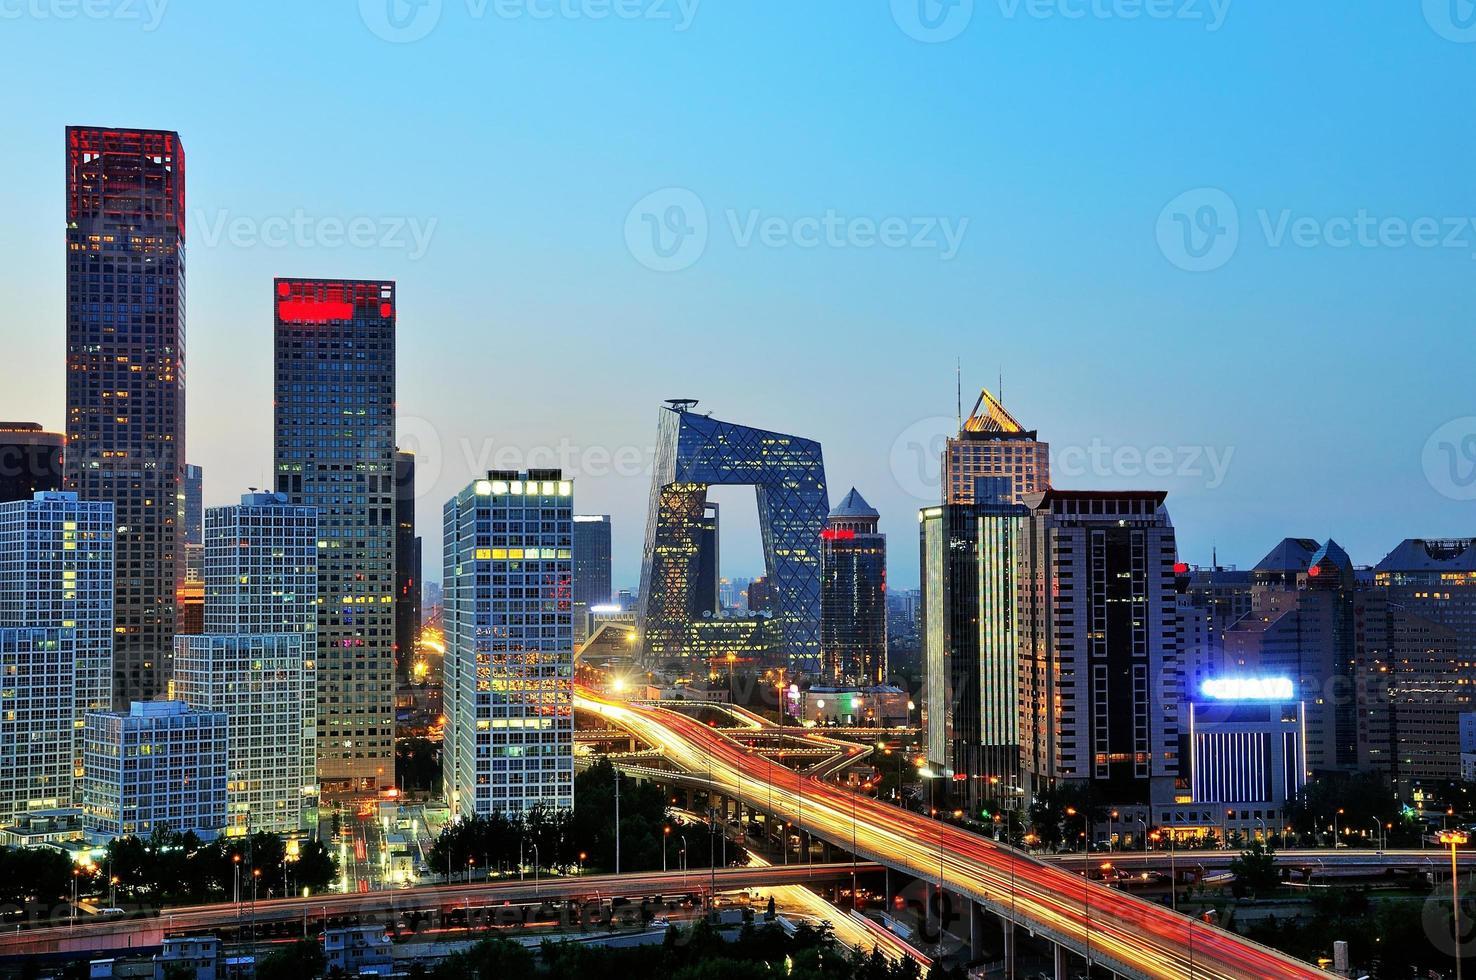 Peking nach Sonnenuntergang-Nacht-Szene von cbd foto